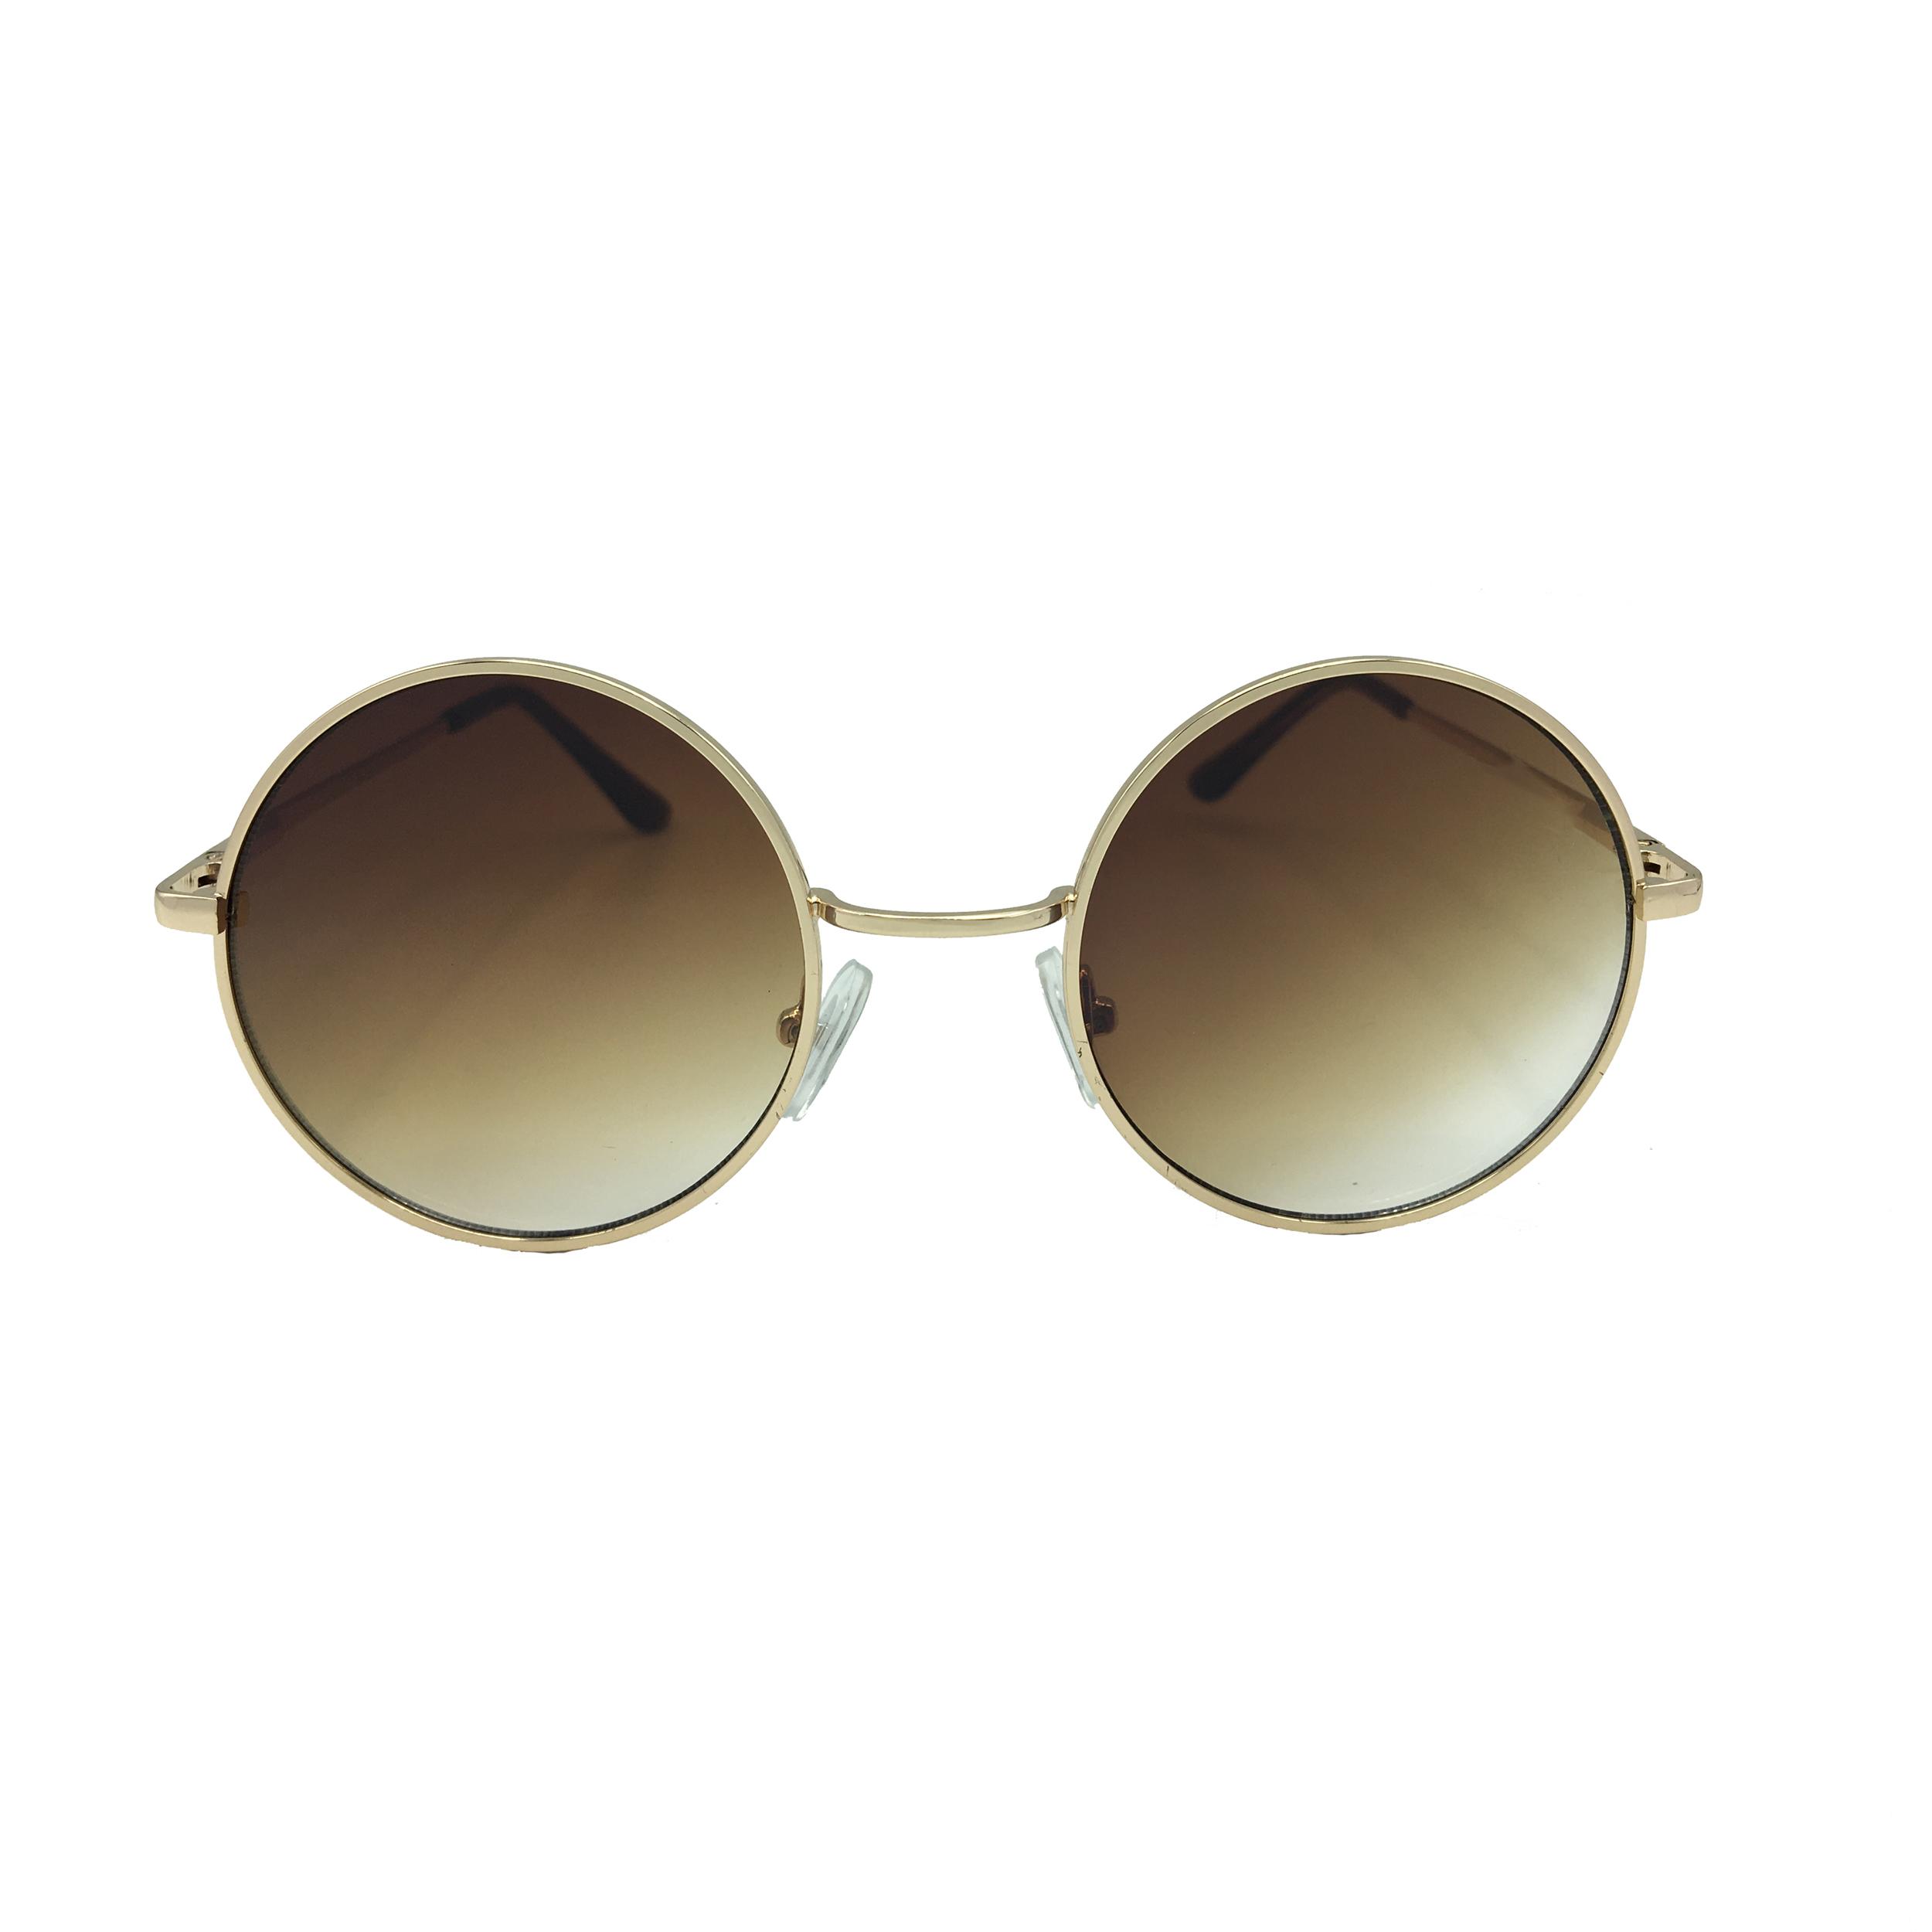 عینک آفتابی کد Re4778t